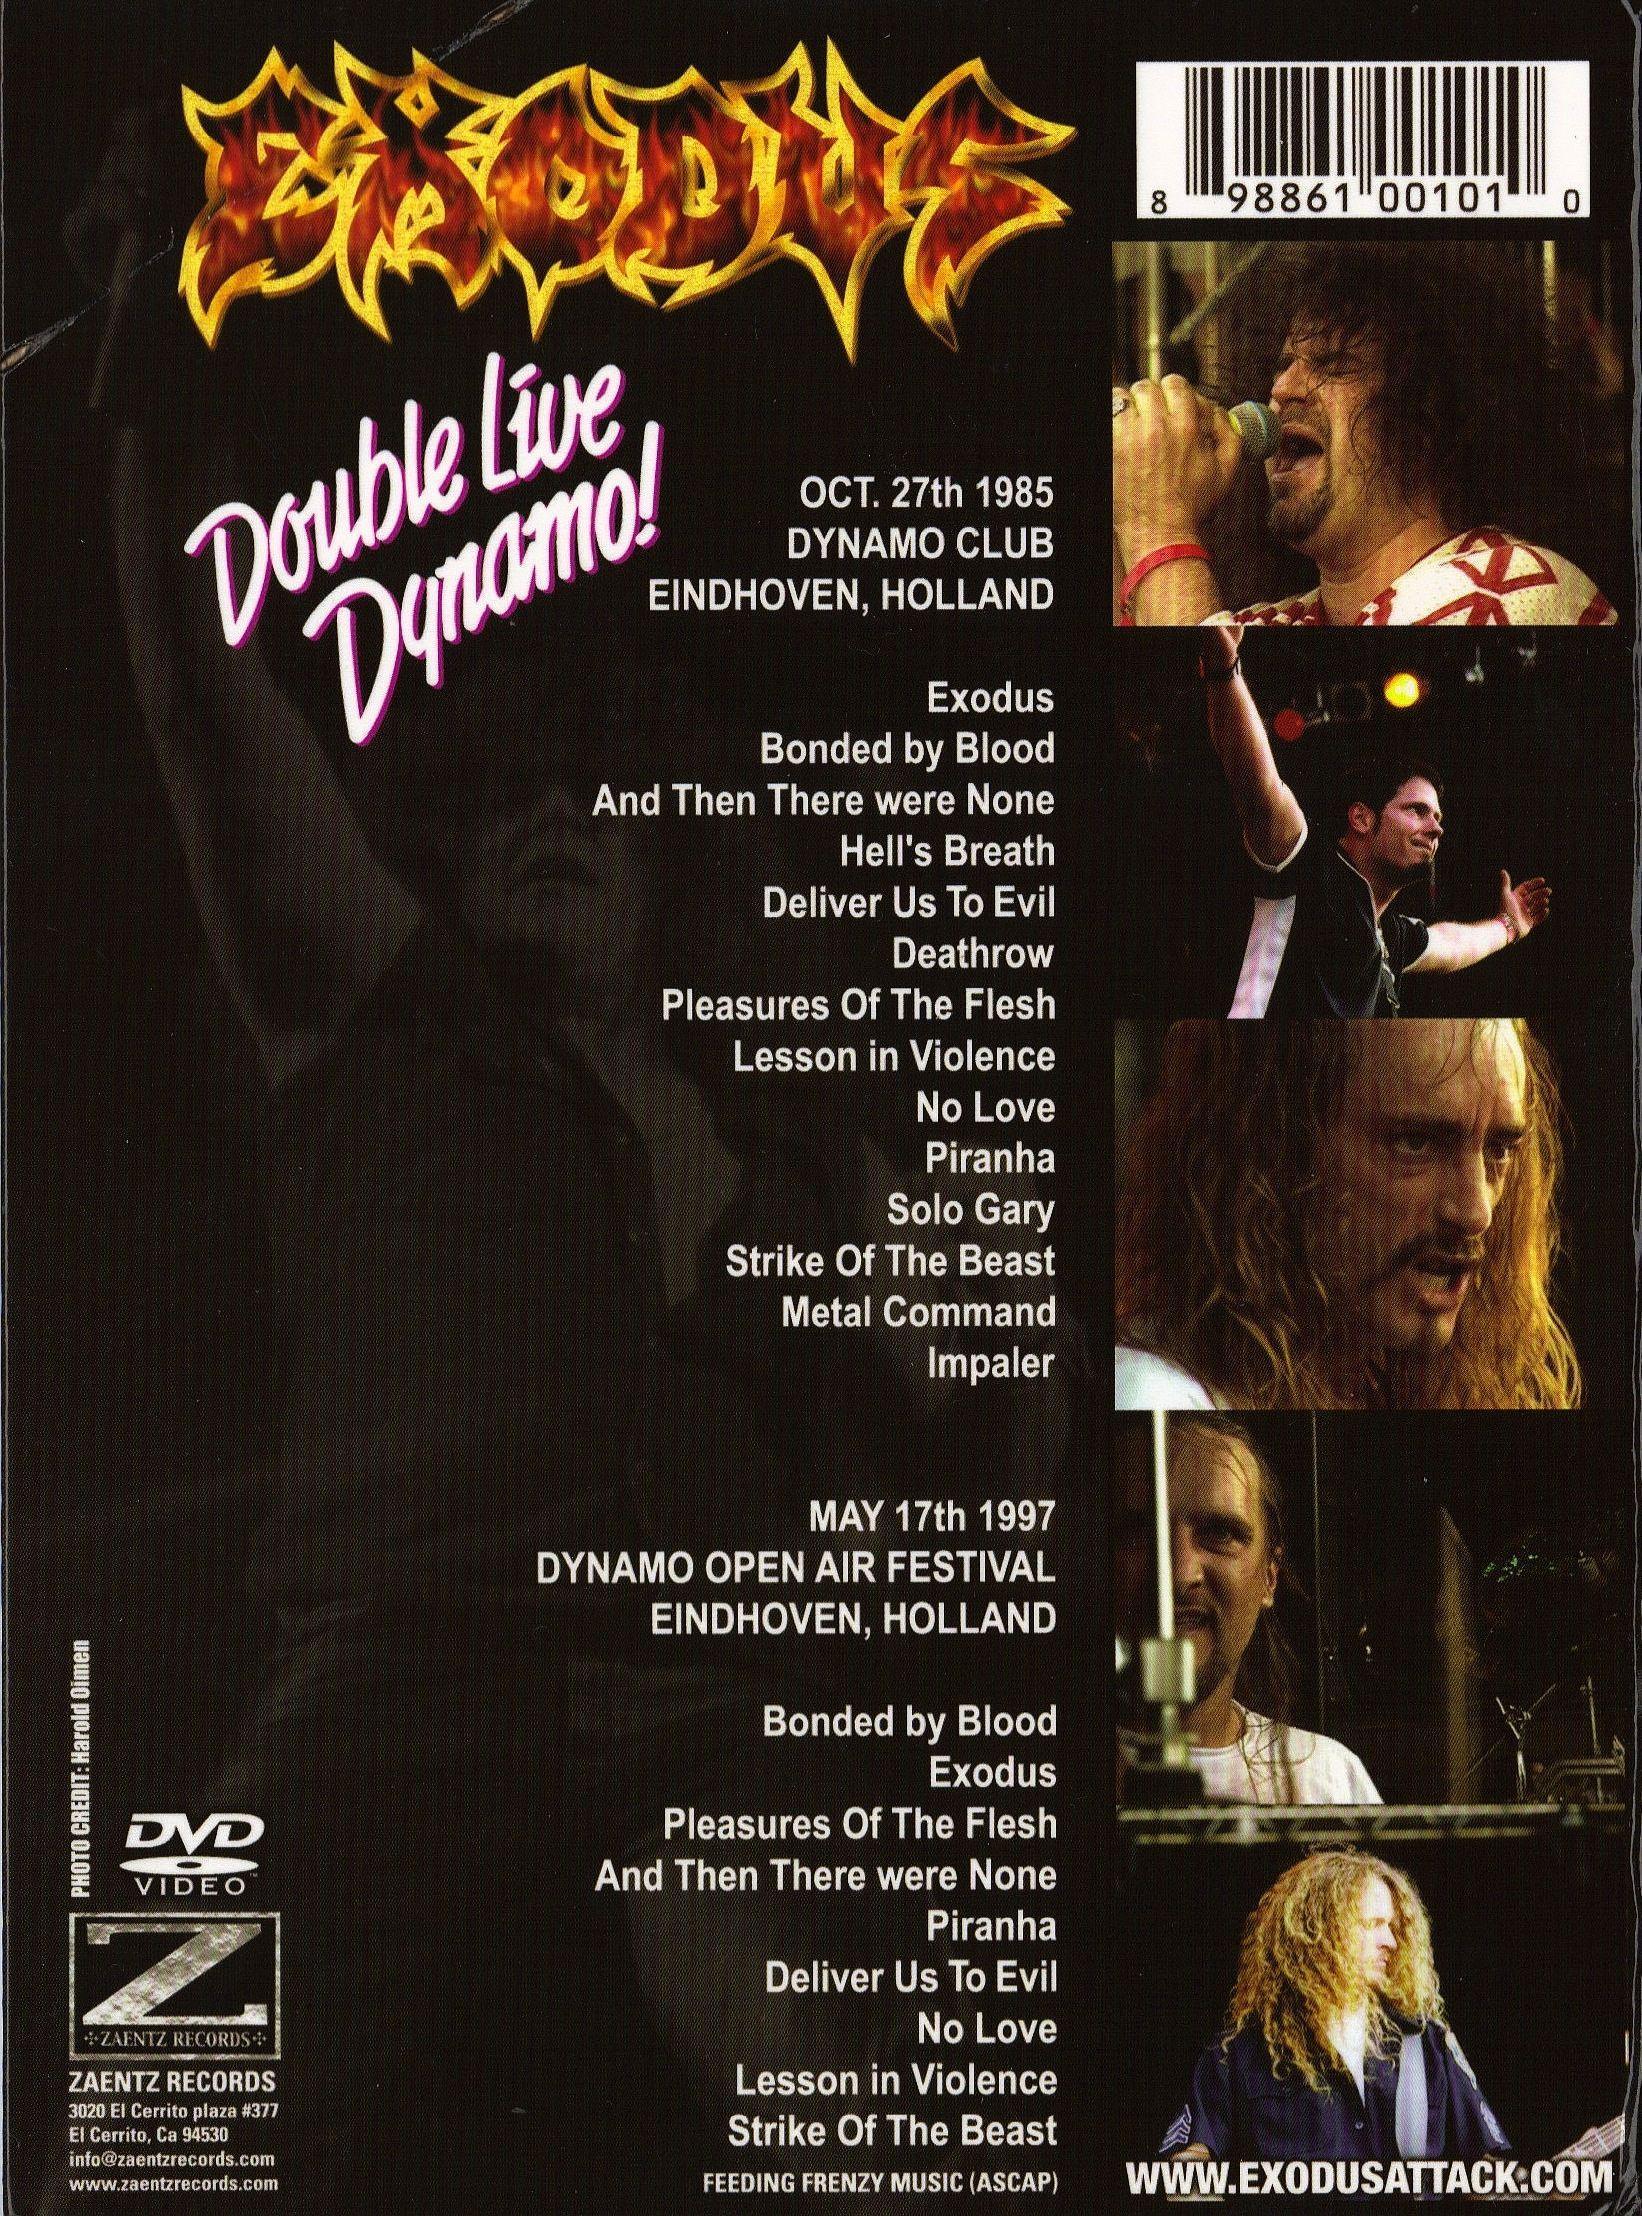 Exodus - Double Live Dynamo (DVD) (2007, Thrash Metal